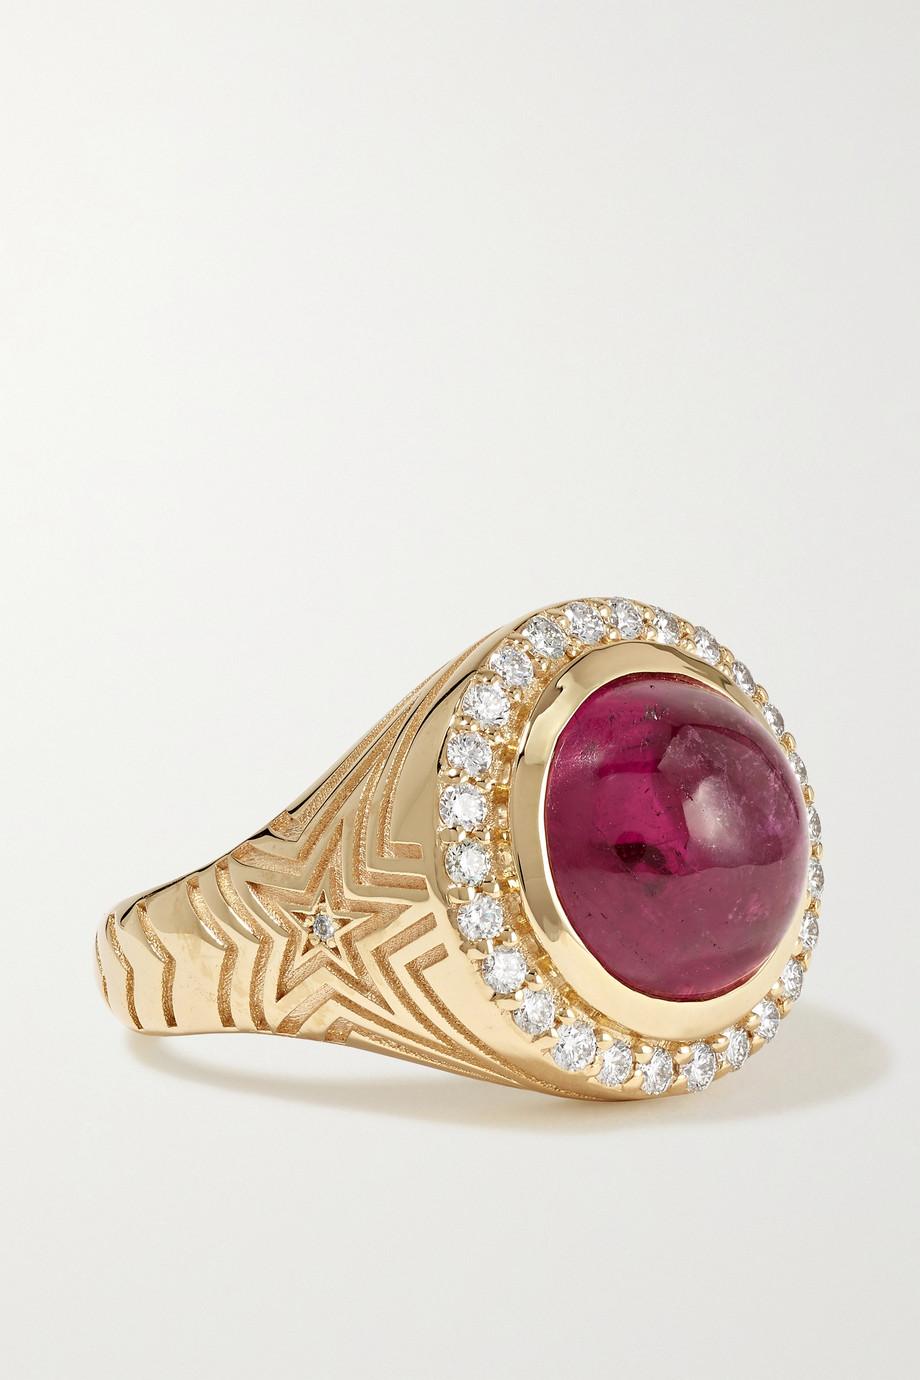 Marlo Laz 14-karat gold, tourmaline and diamond ring